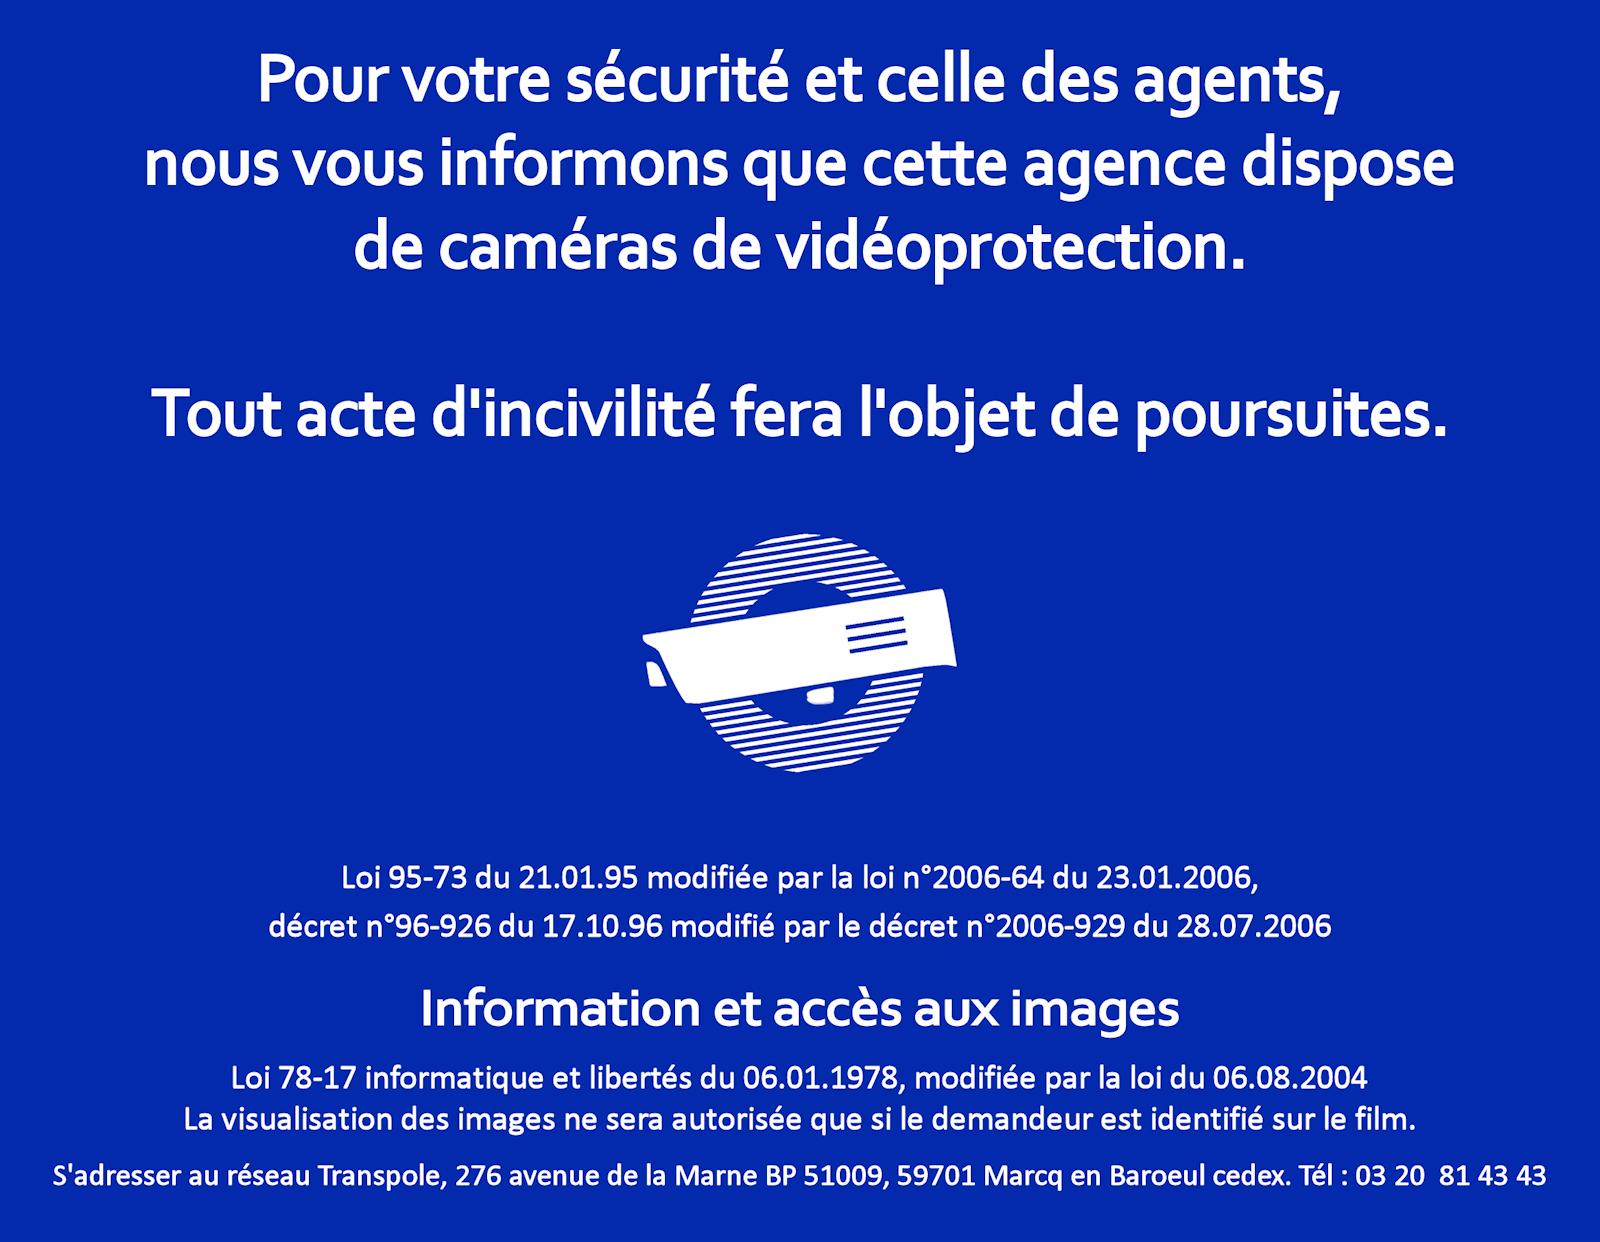 Vidéoprotecion Agence ilévia Tourcoing